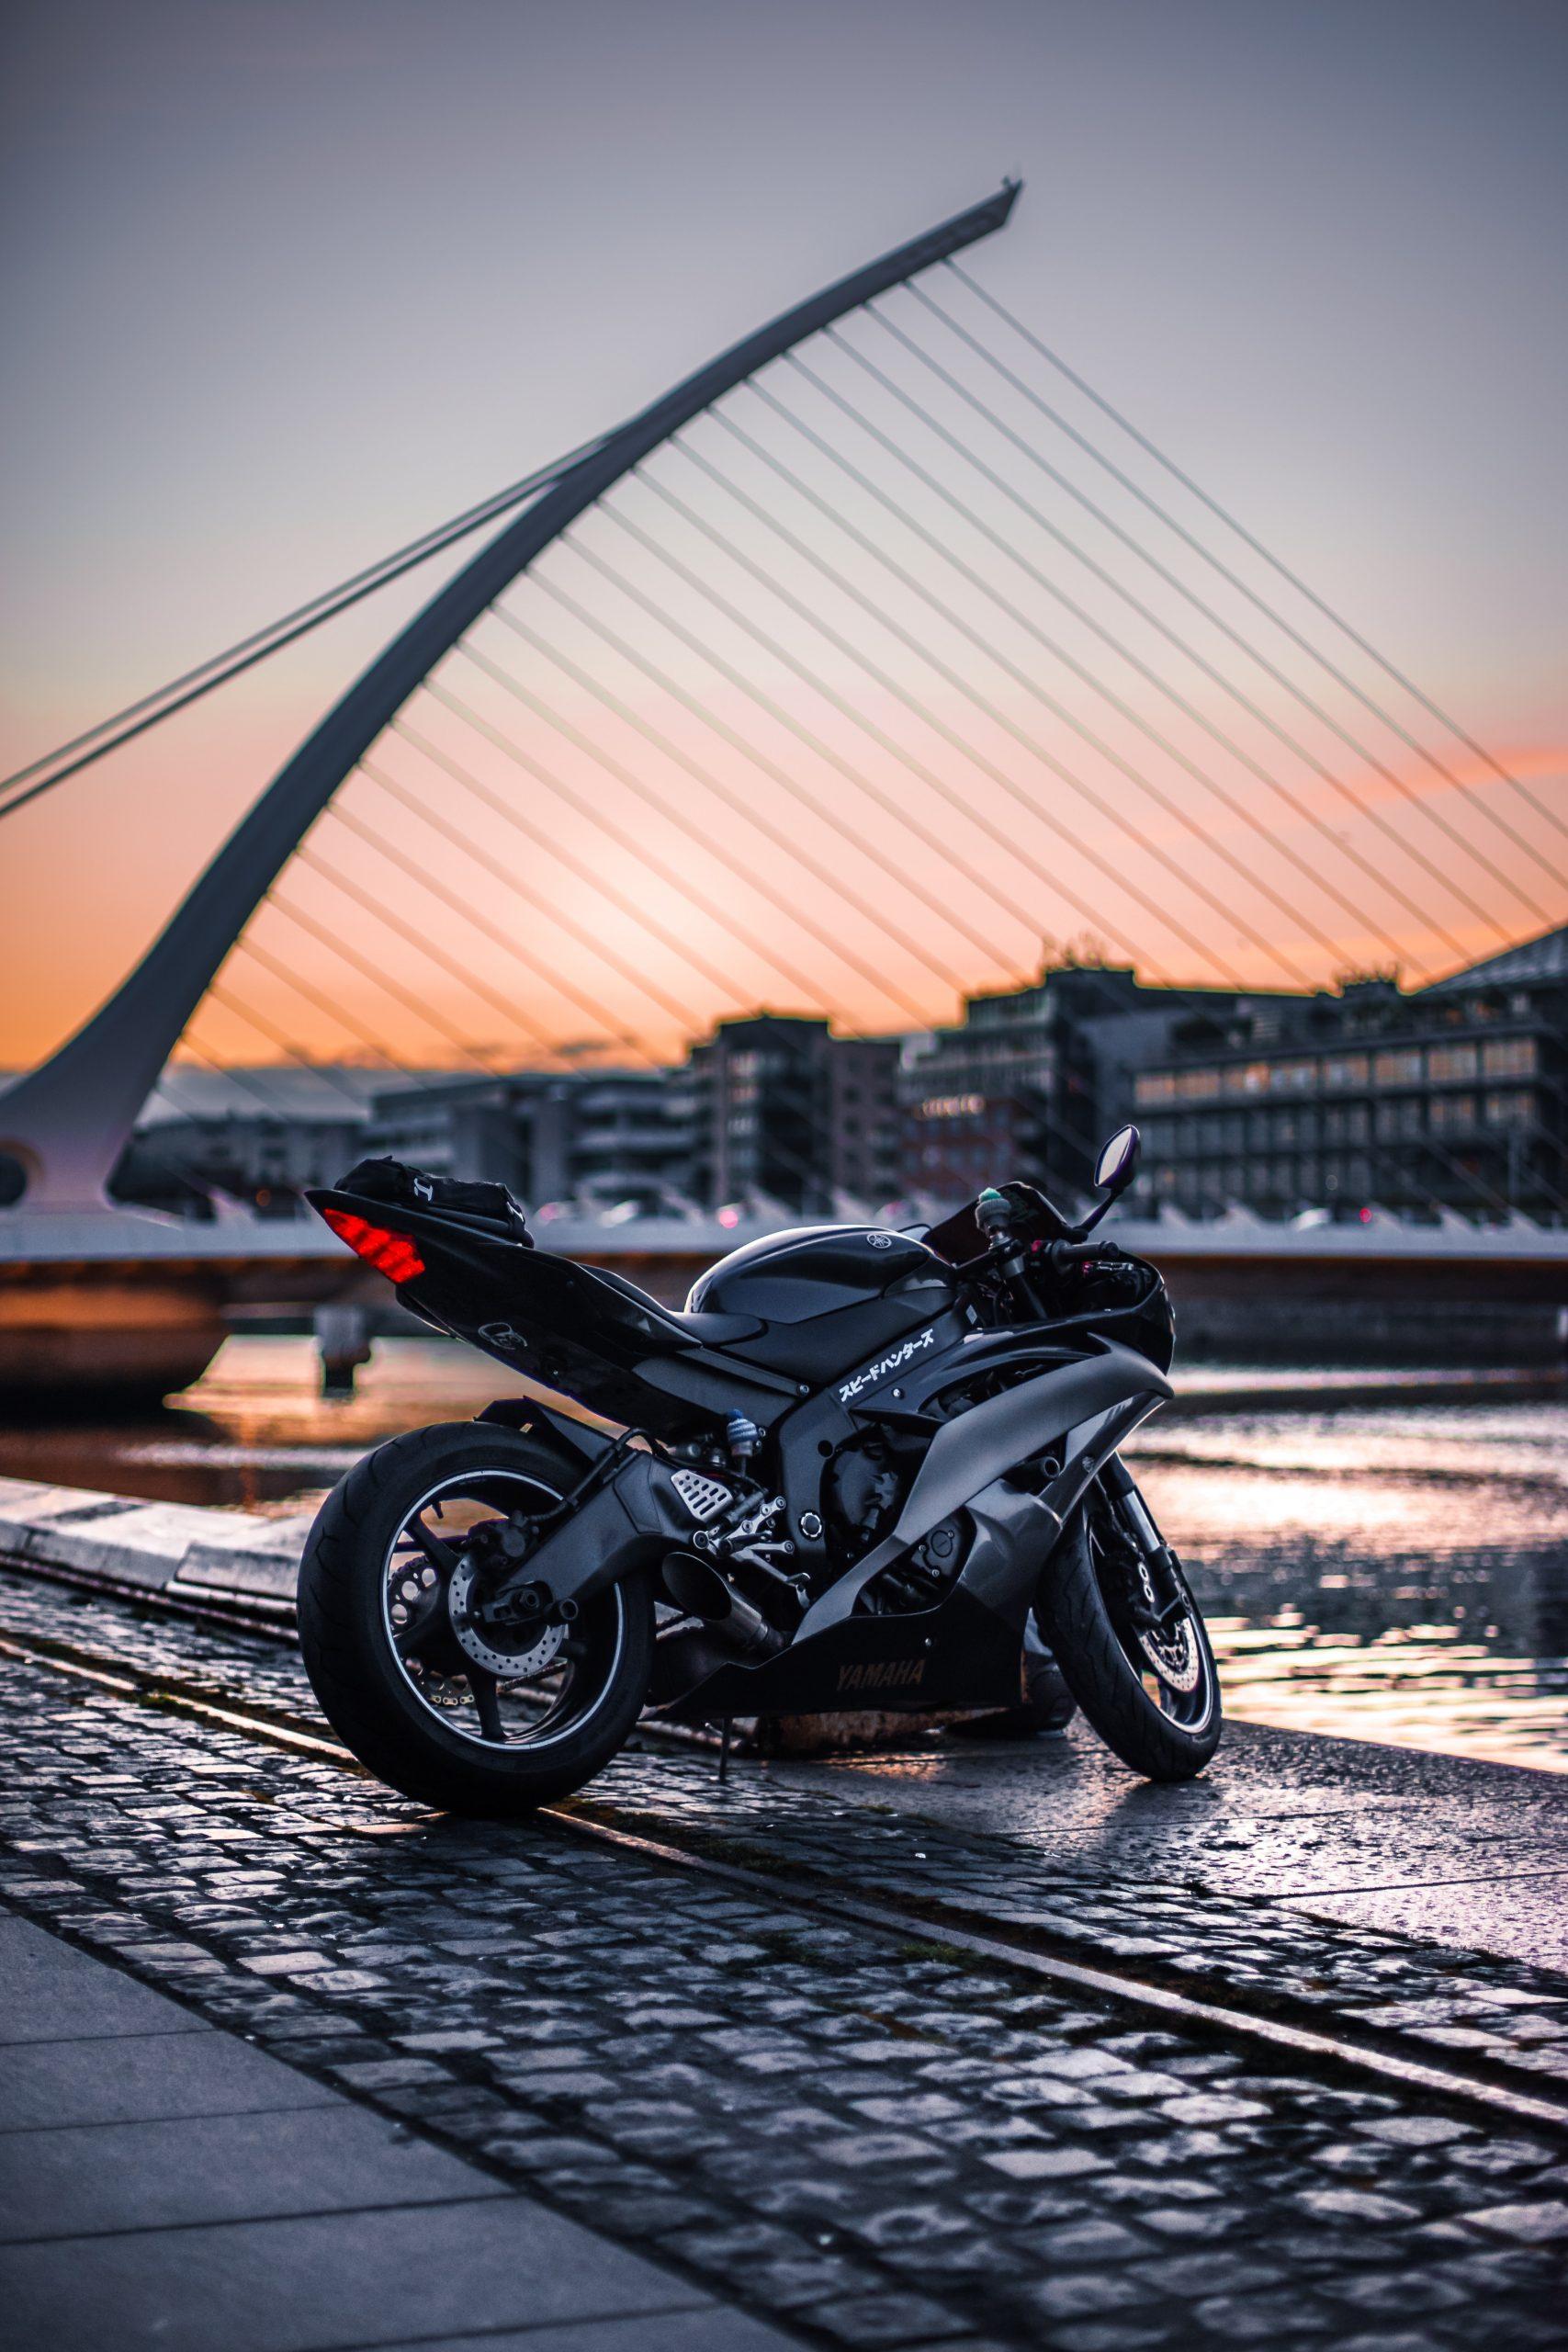 wallpaper Black sports bike at daytime